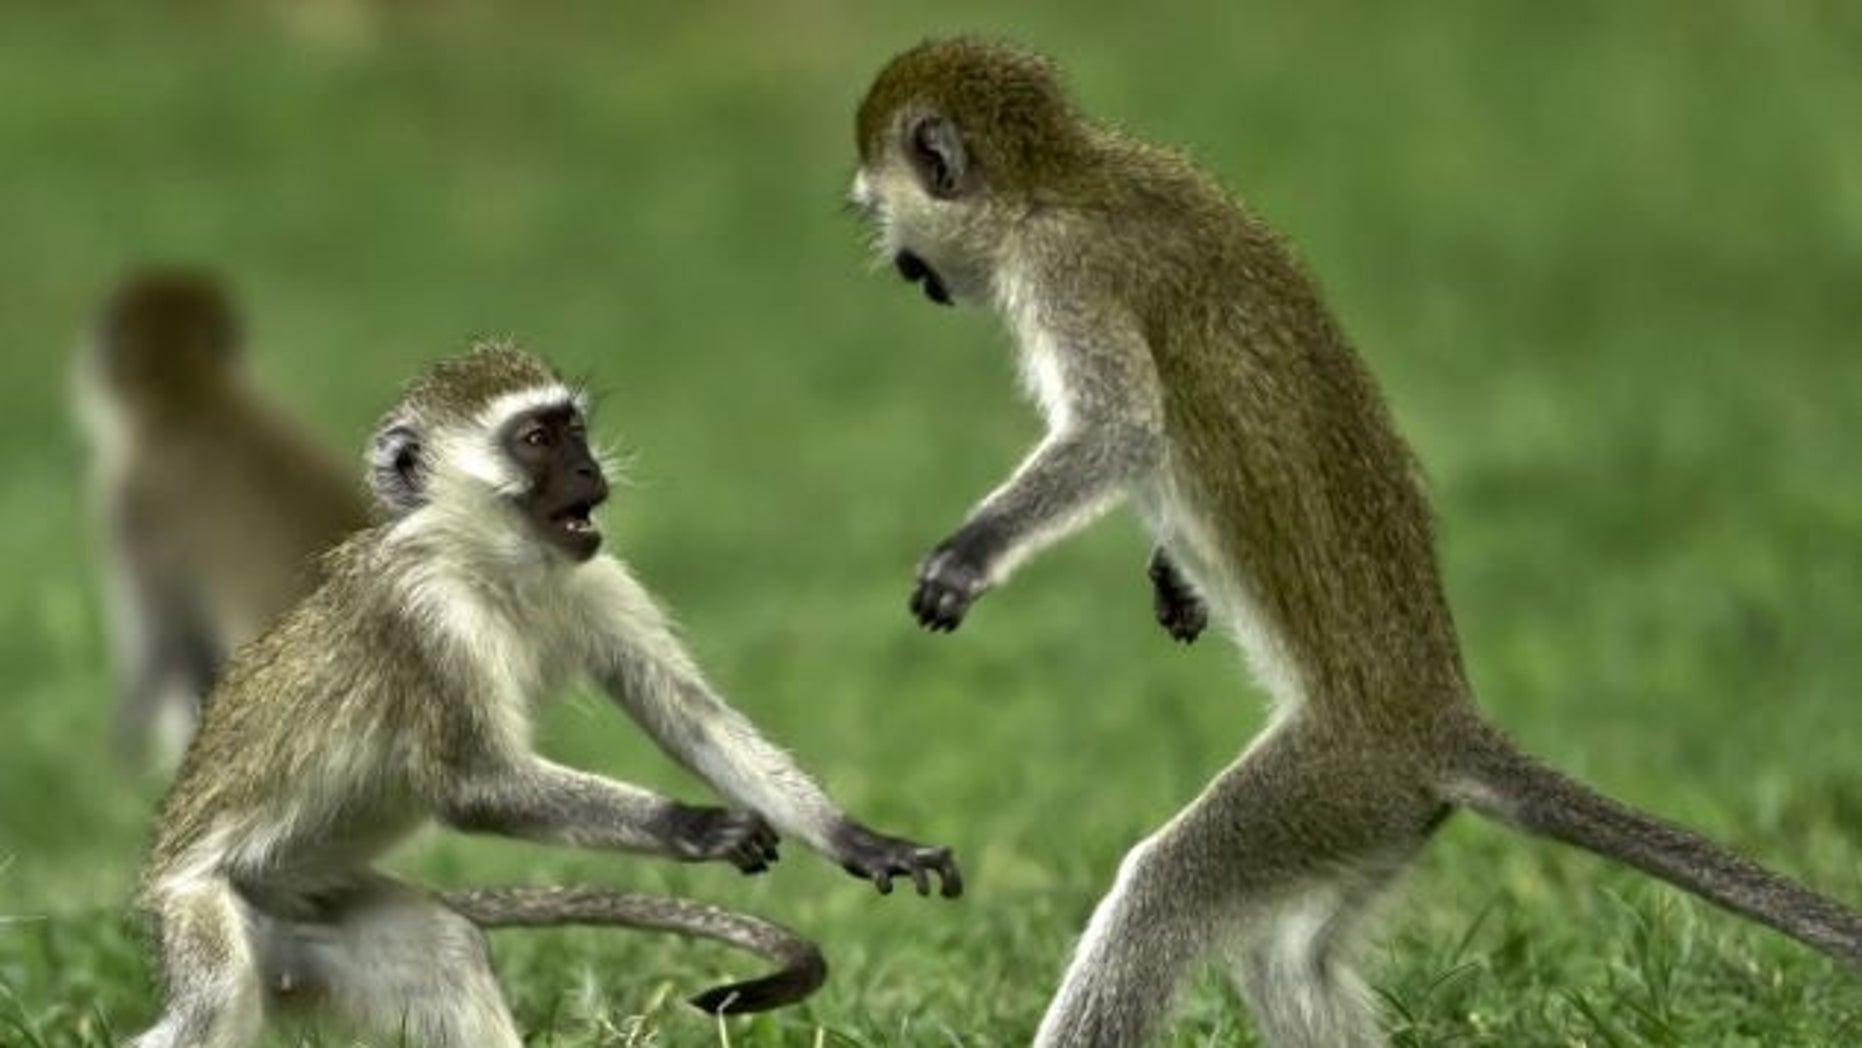 Vervet monkeys playing in Kenya's Great Rift Valley in 2012.